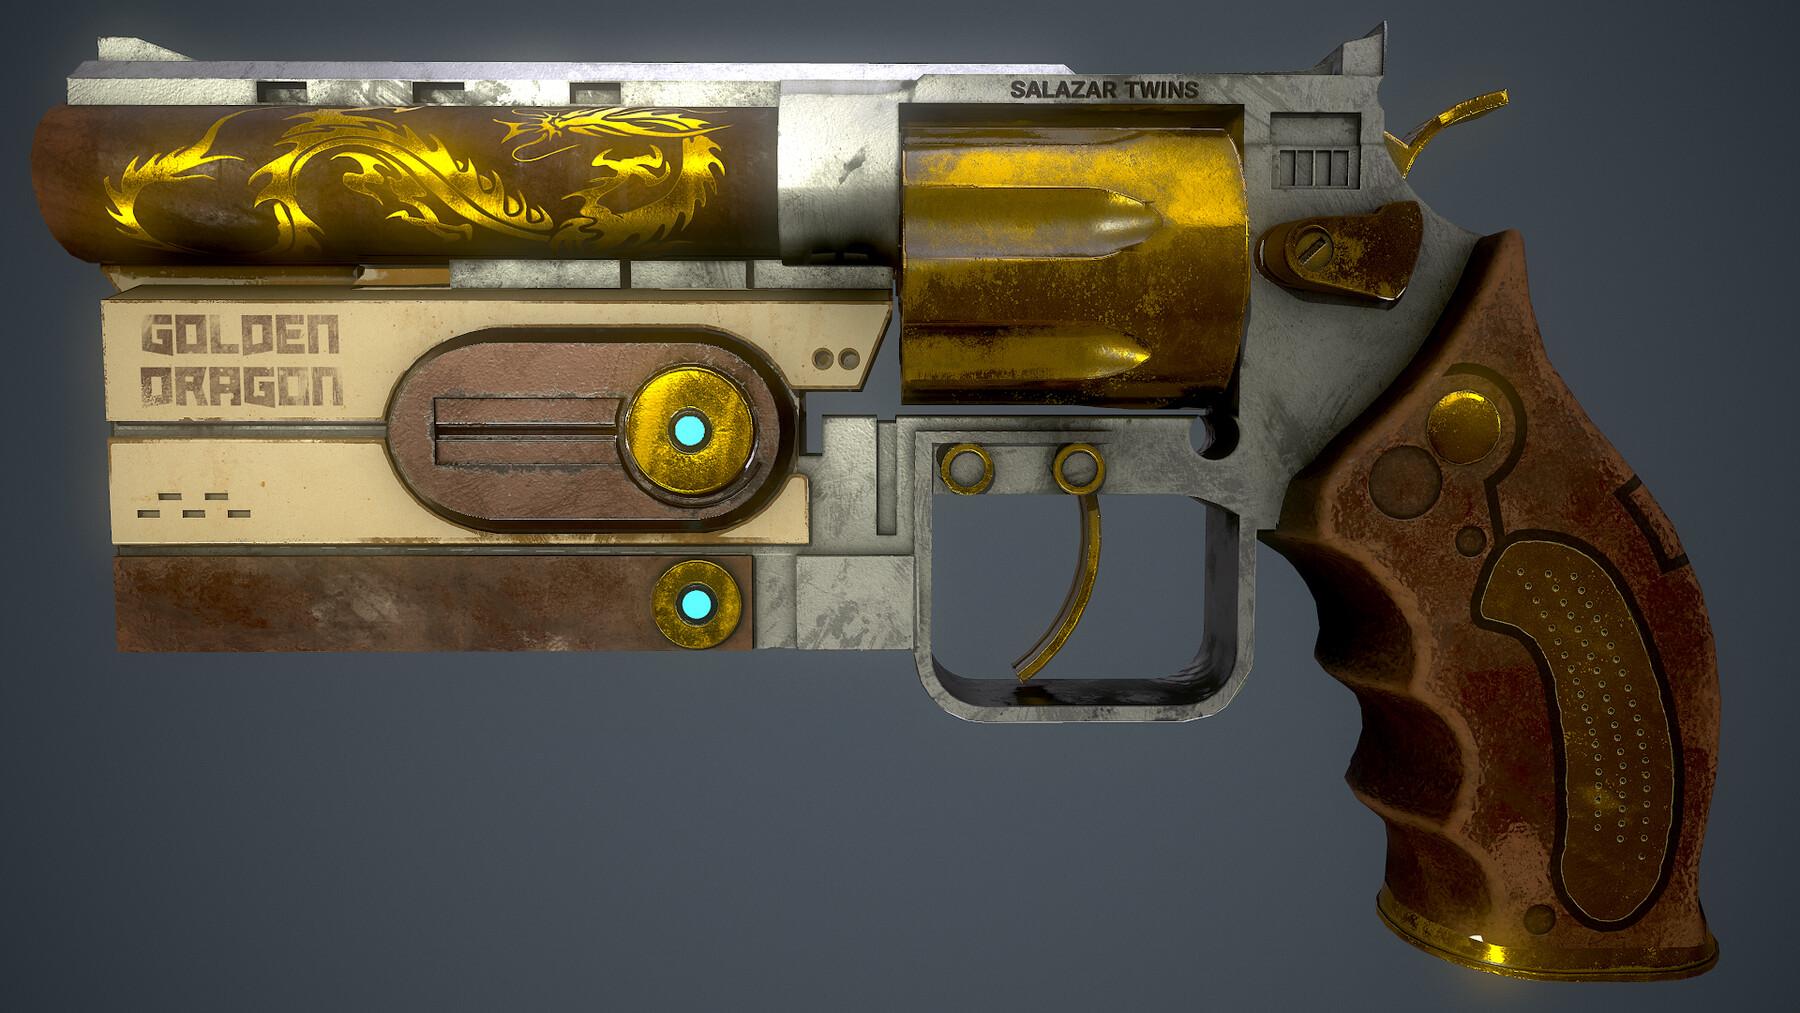 Gold dragon pistol golden dragon buffet coupons